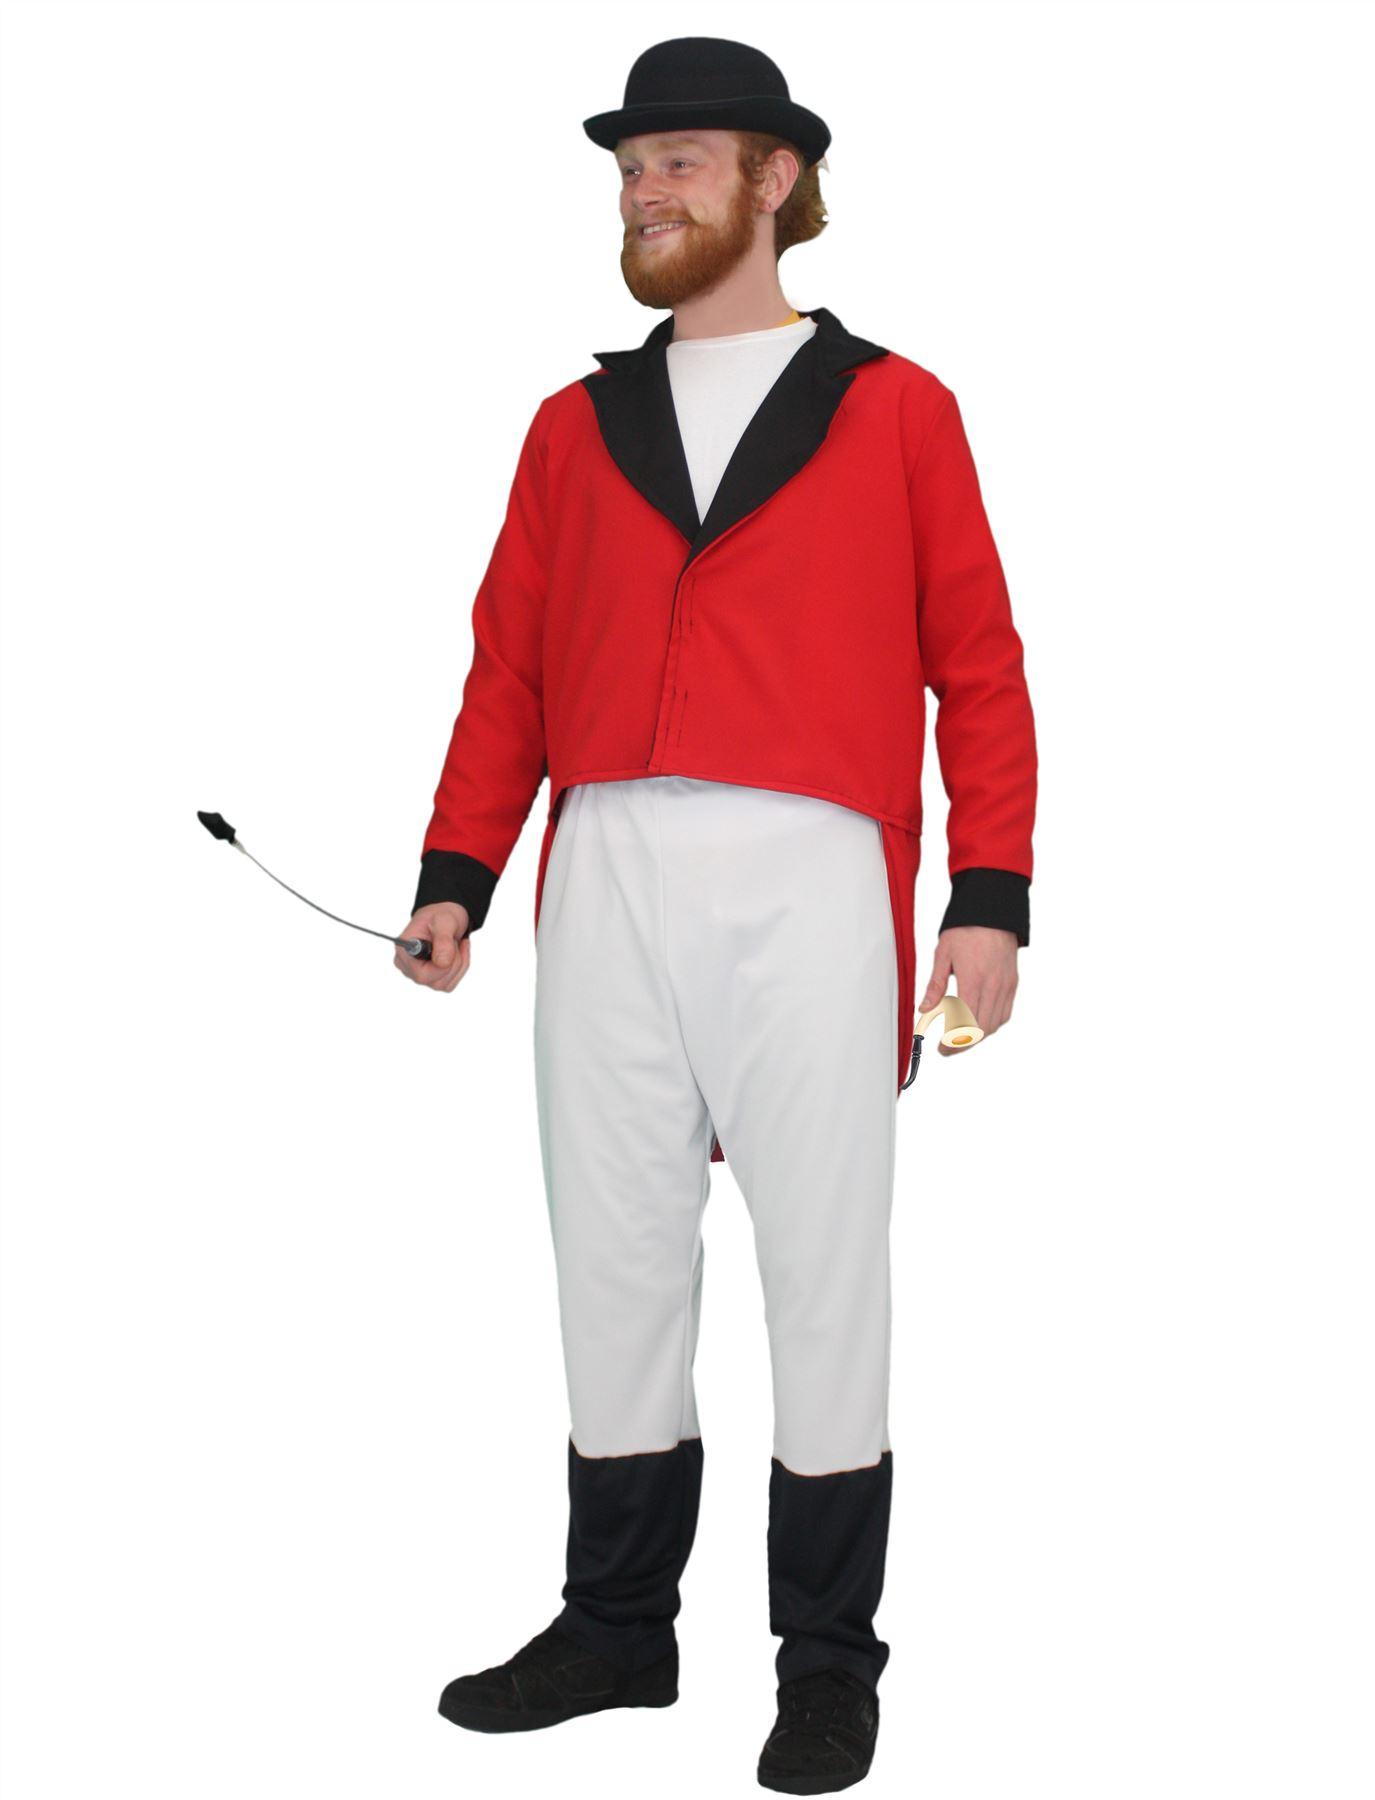 Deluxe Fox Hunter Costume - Red Jacket, Jockey Trousers & Bowler Hat